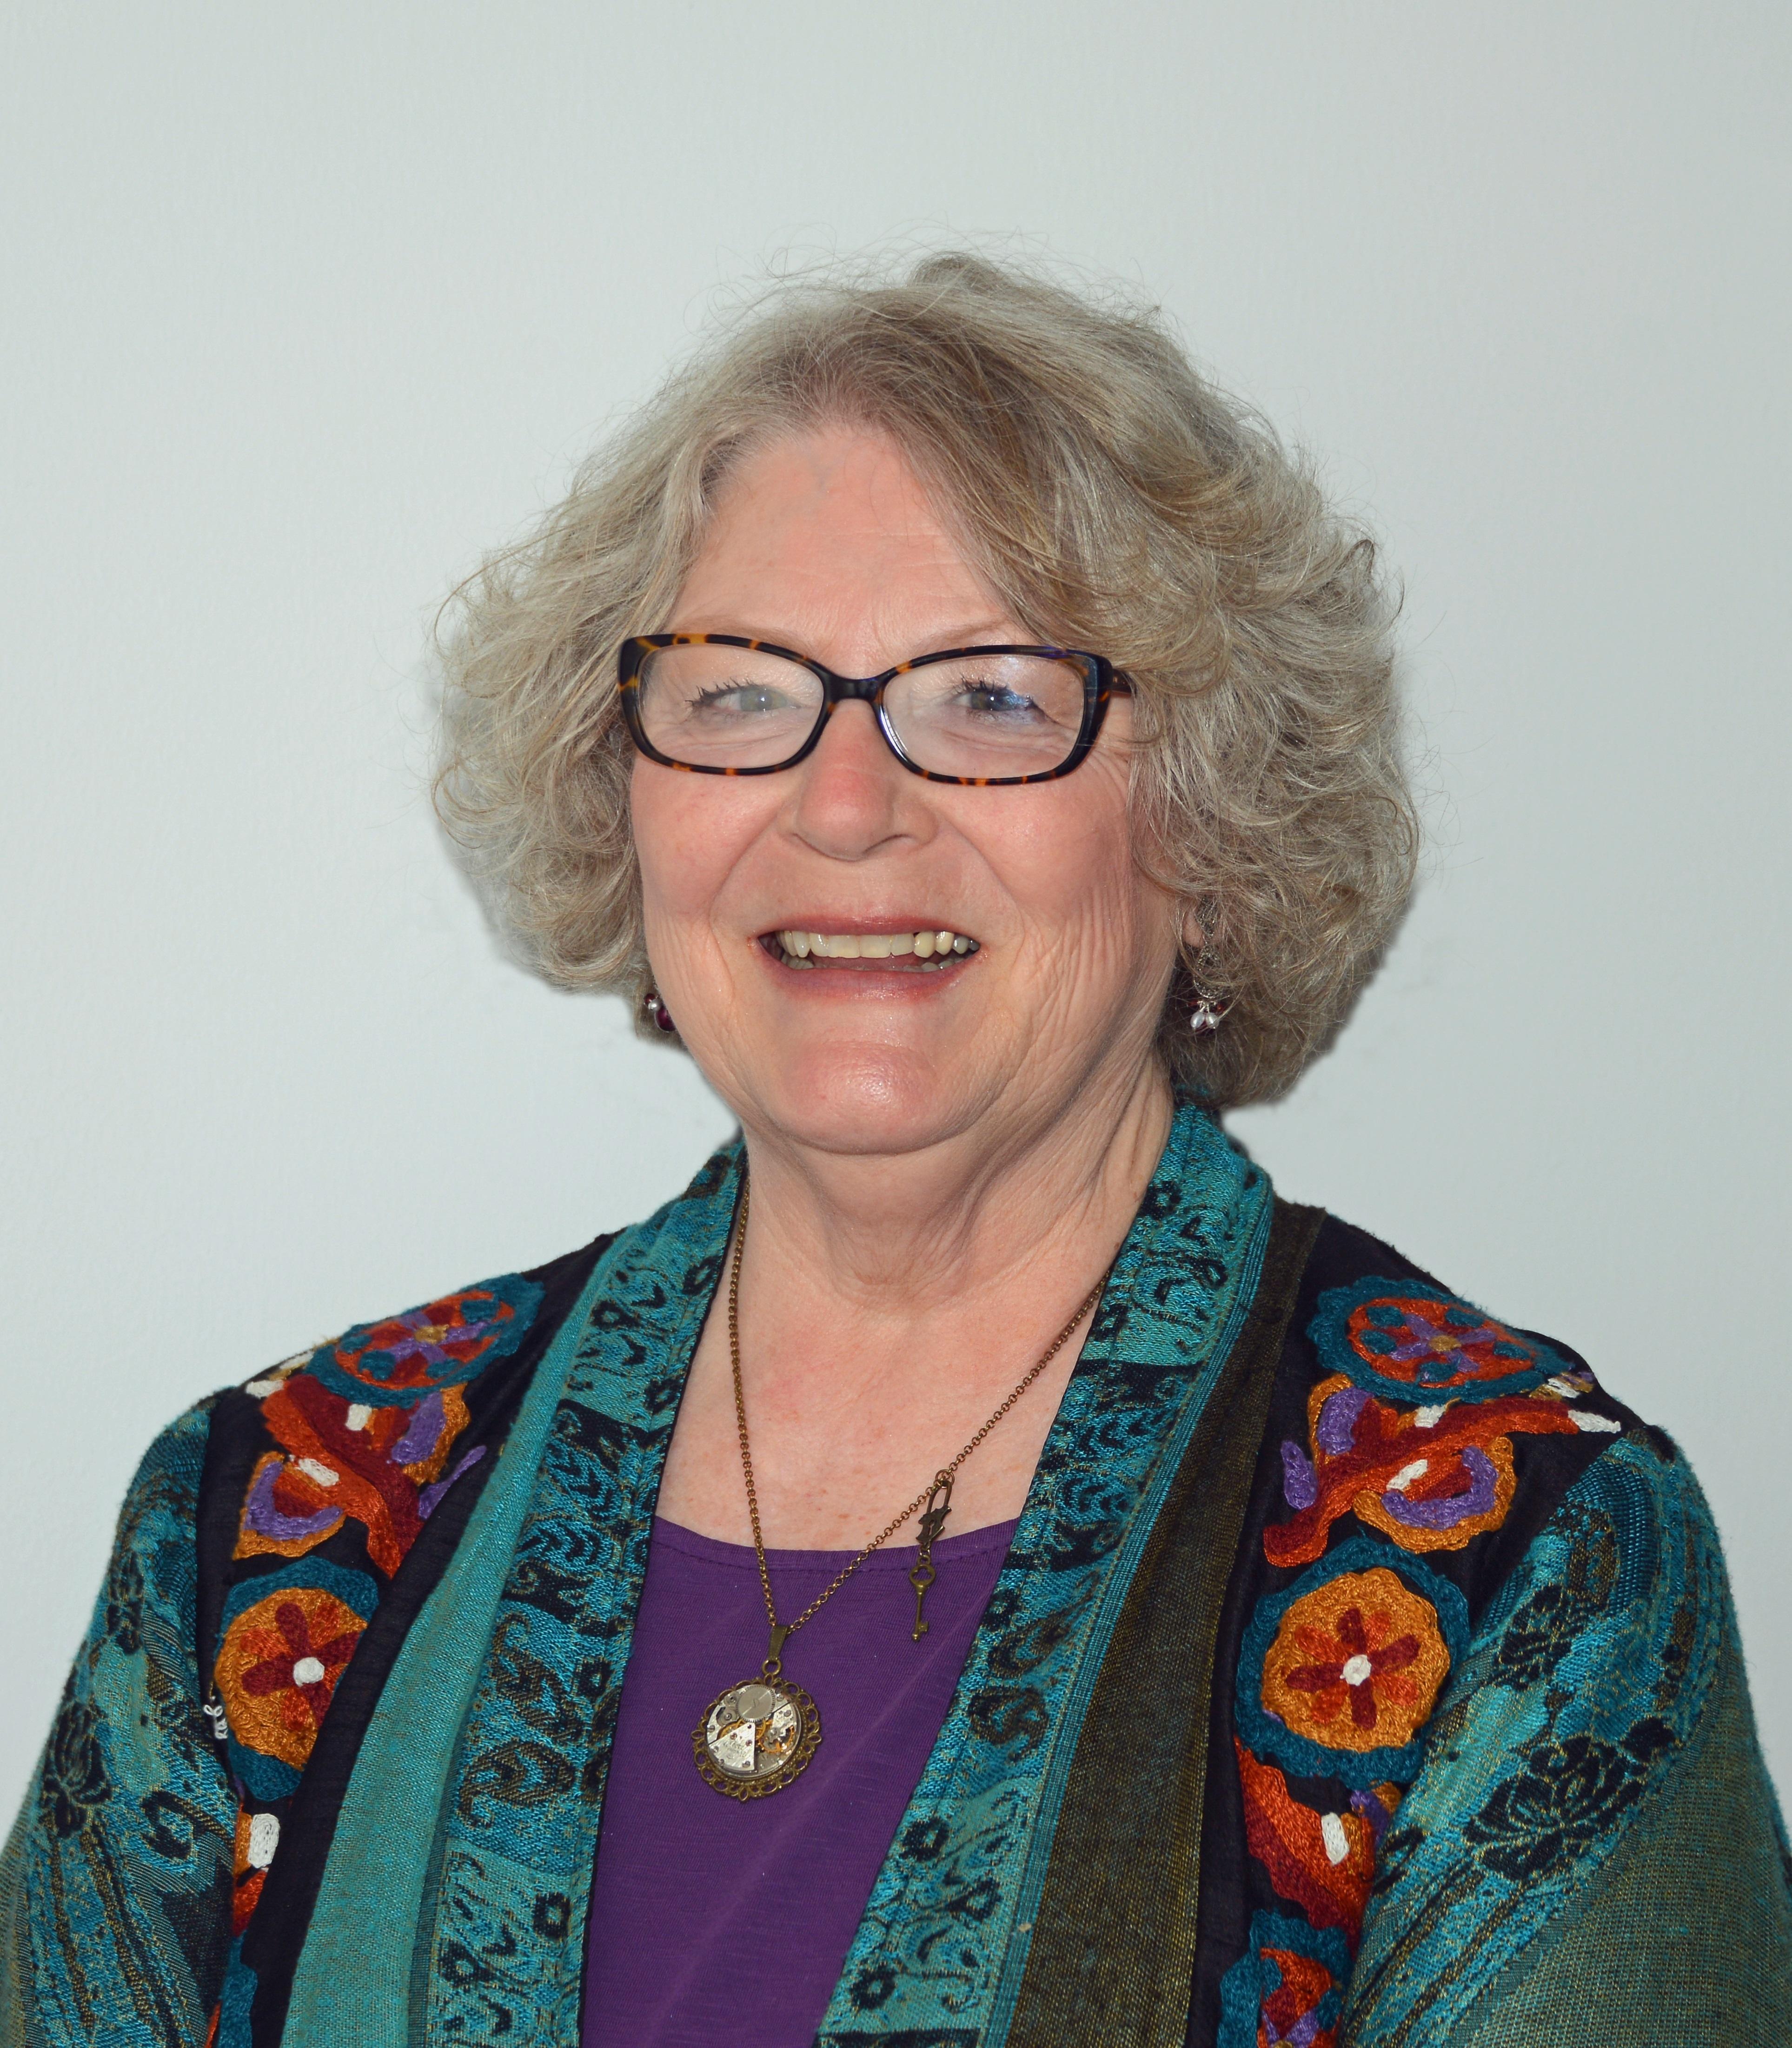 Lolieta Miller